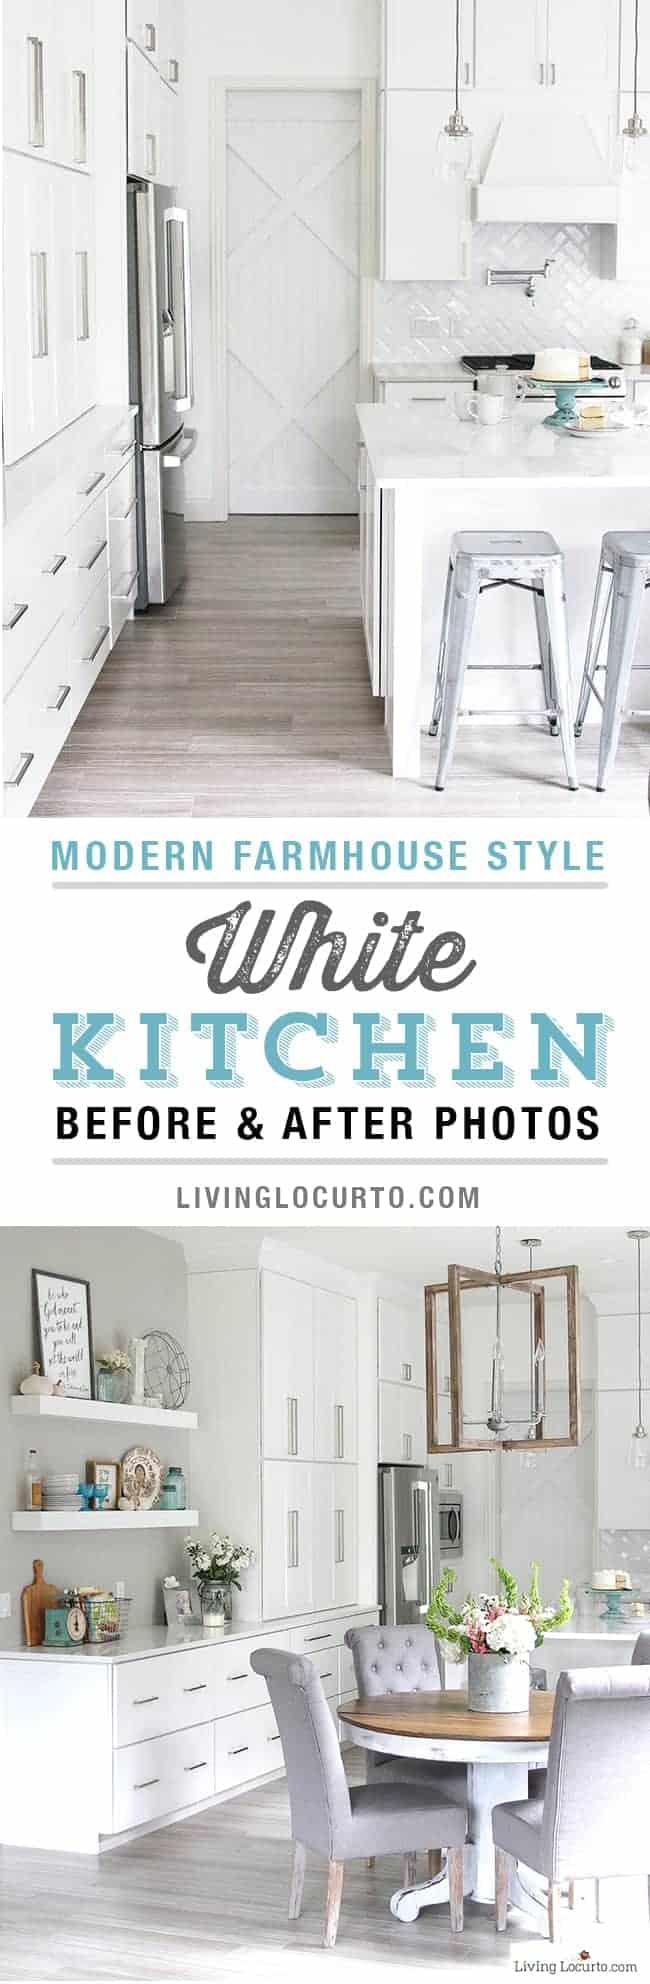 White Kitchen Modern Farmhouse by Living Locurto | Dreamy Modern Farmhouse Kitchens